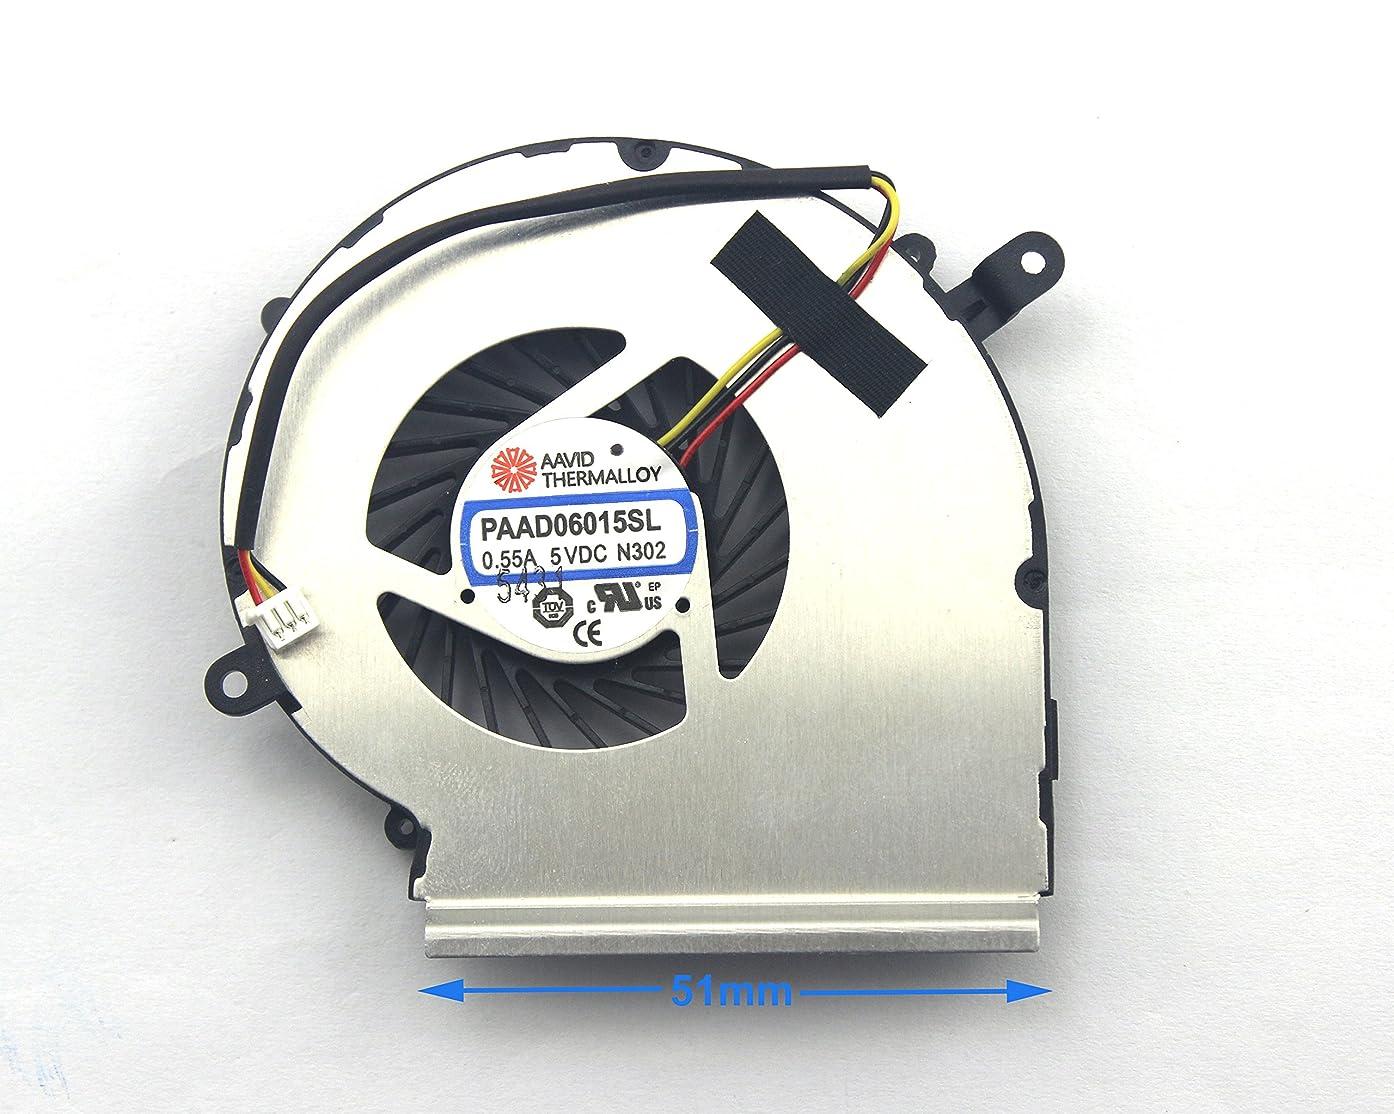 CHNASAWE Laptop GPU (Not CPU) Cooling Fan for MSI Gaming GP62 2QD GP62 2QE GP62 6QE GP62 6QF GP72 2QD GP72 2QE GP72 6QE GP72 6QF